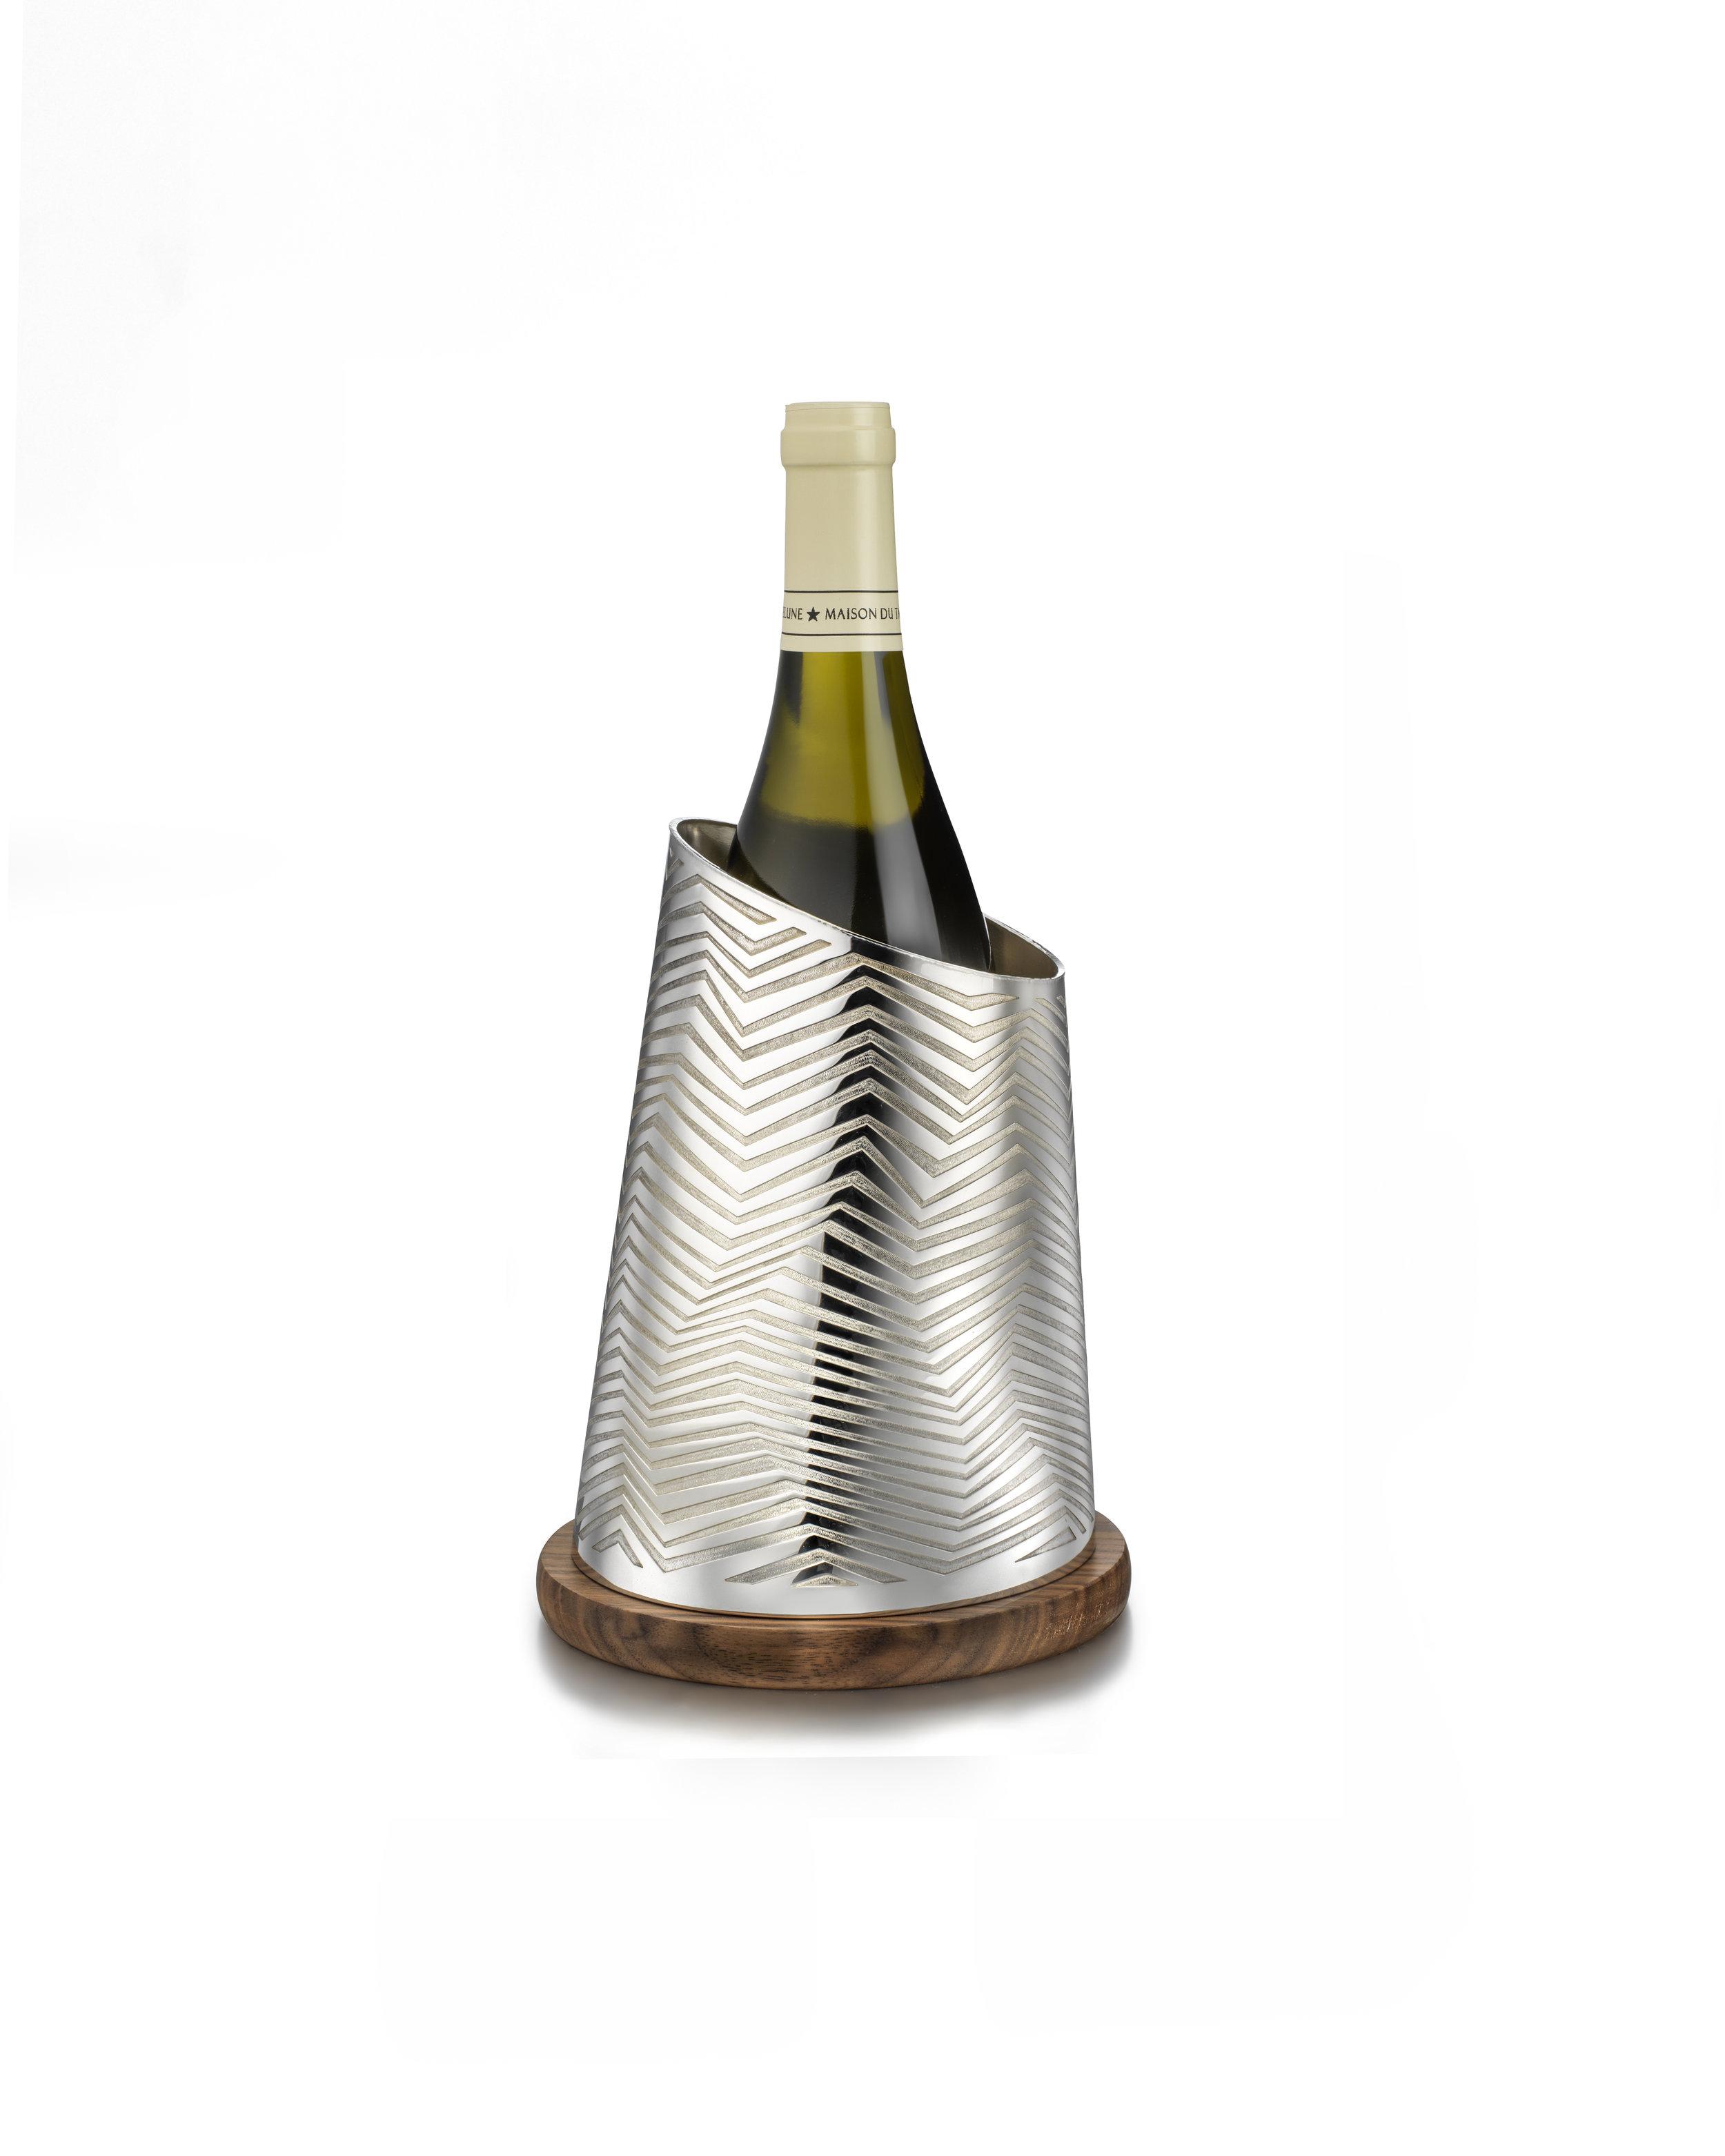 wine cooler3.jpg copy.jpg